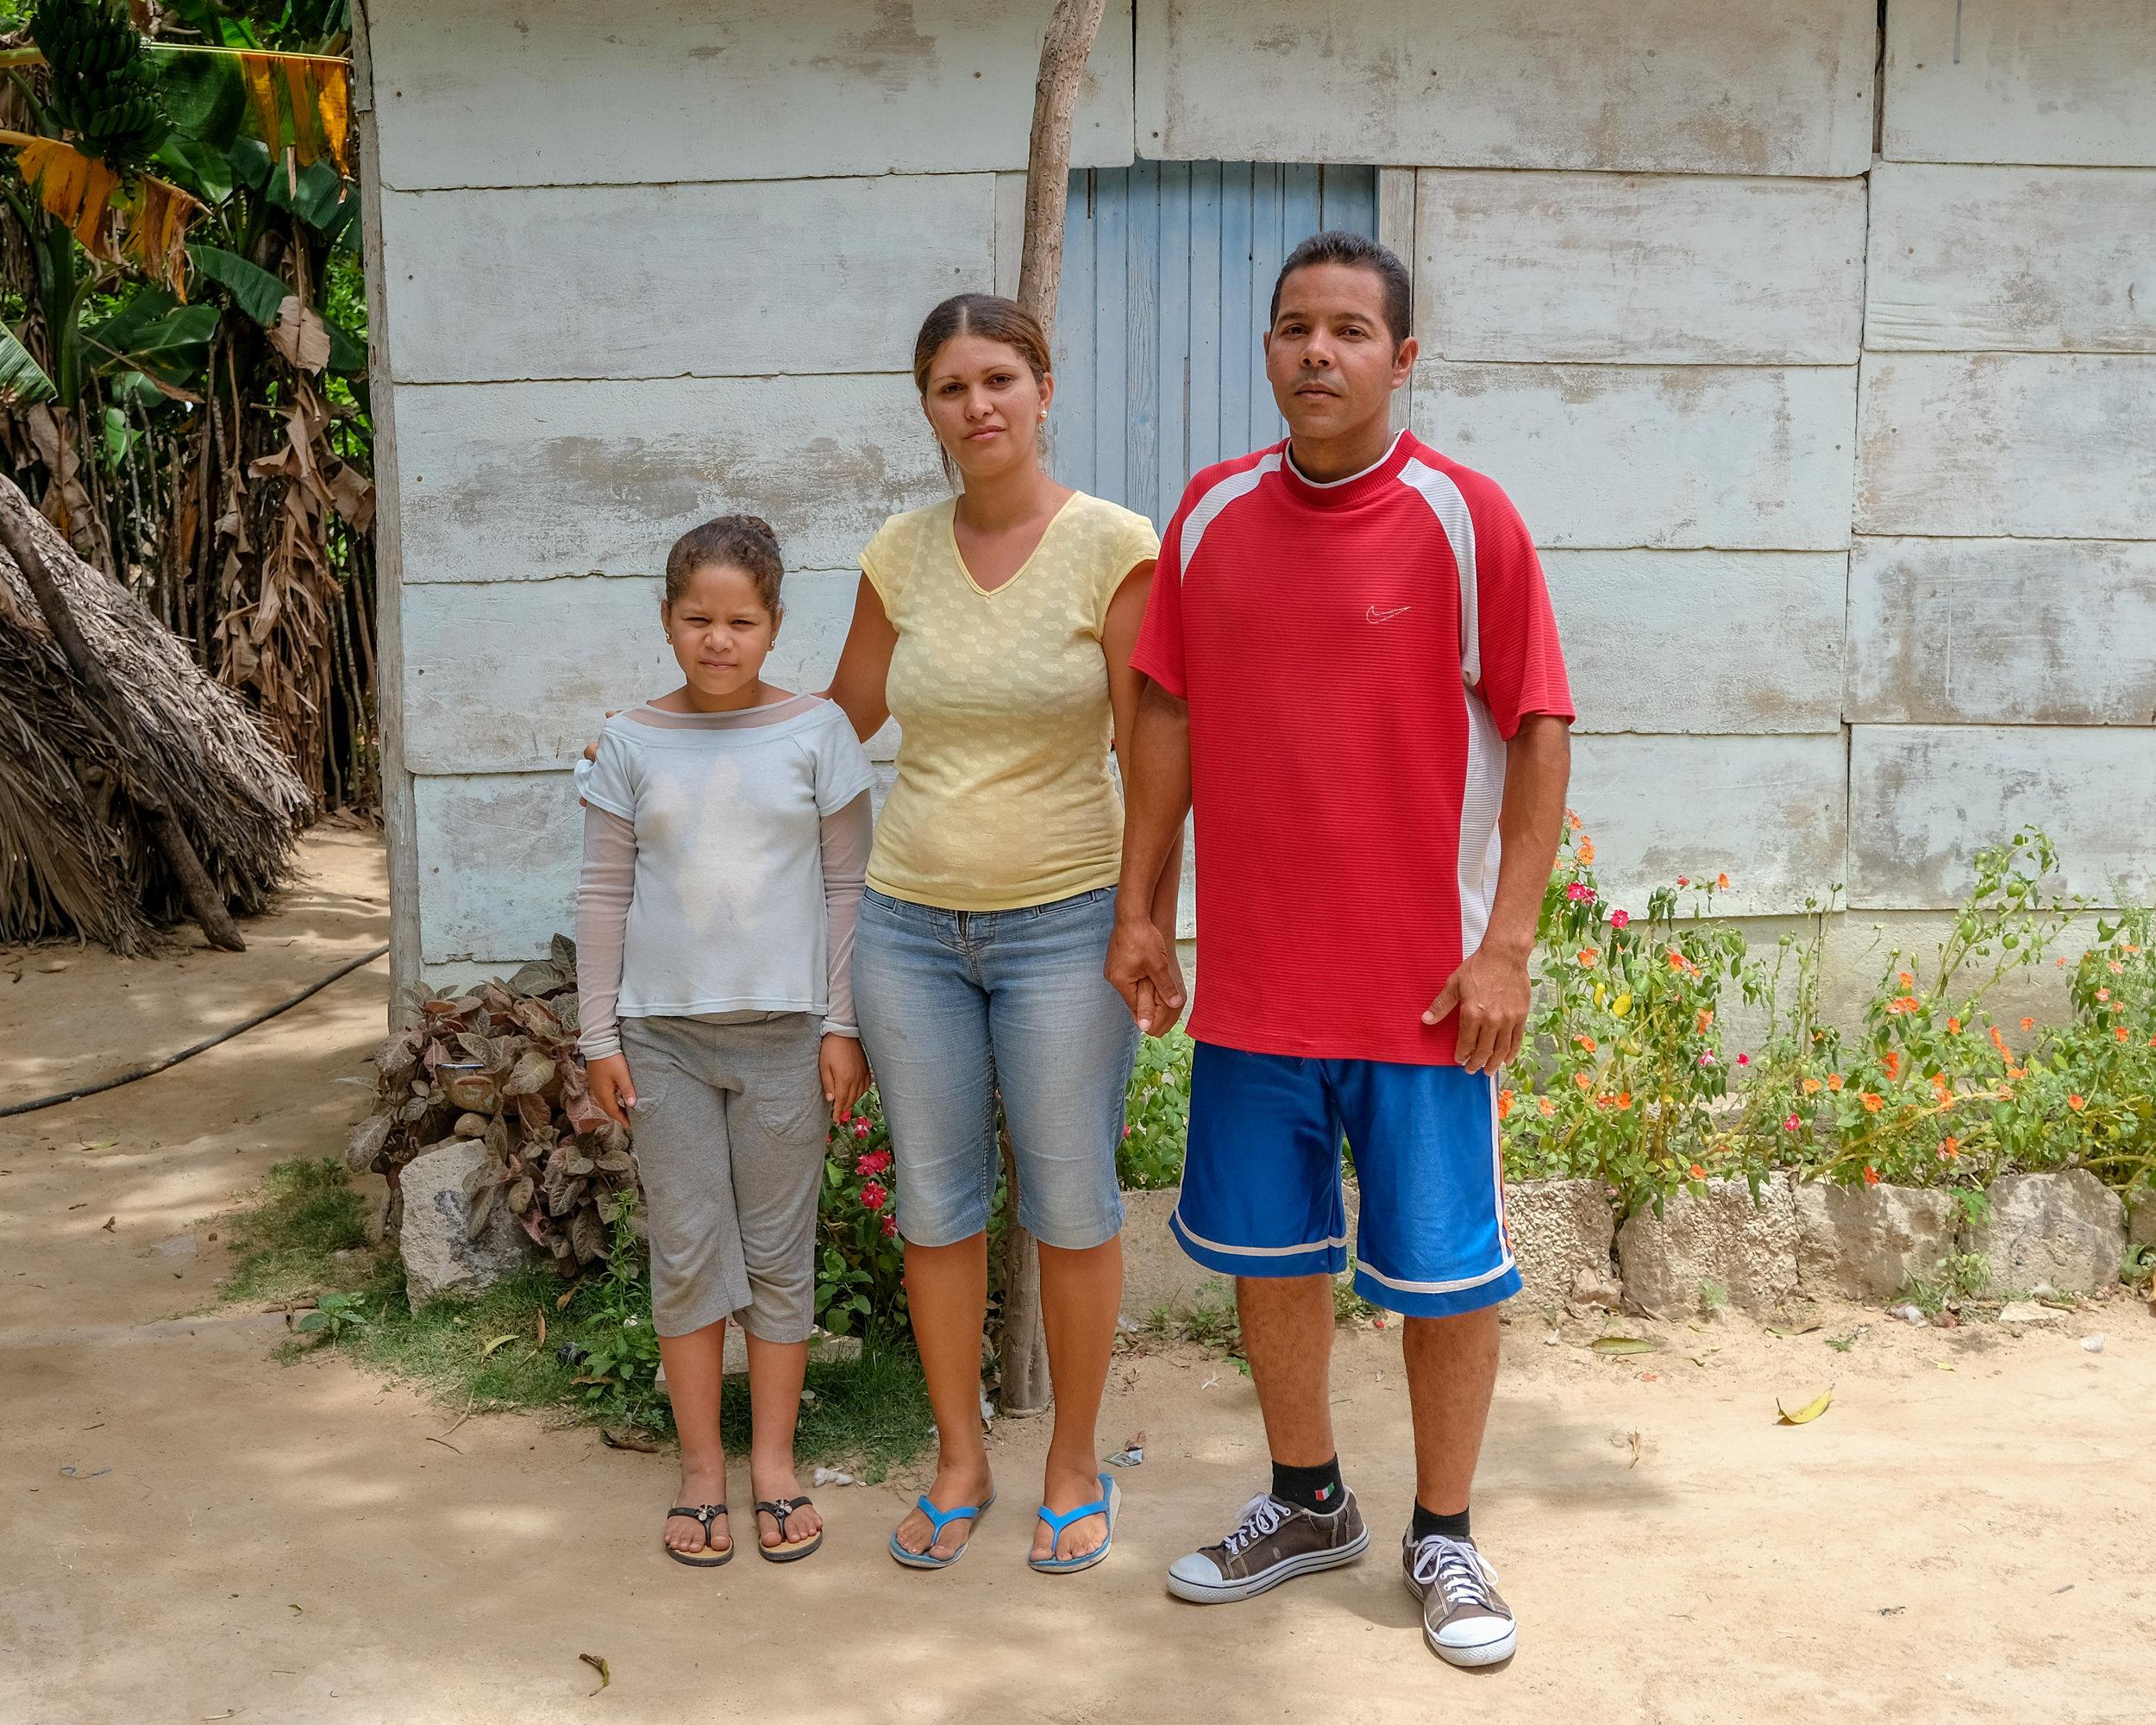 Their first Family Picture!- Noemi, Yuneiris & Marino